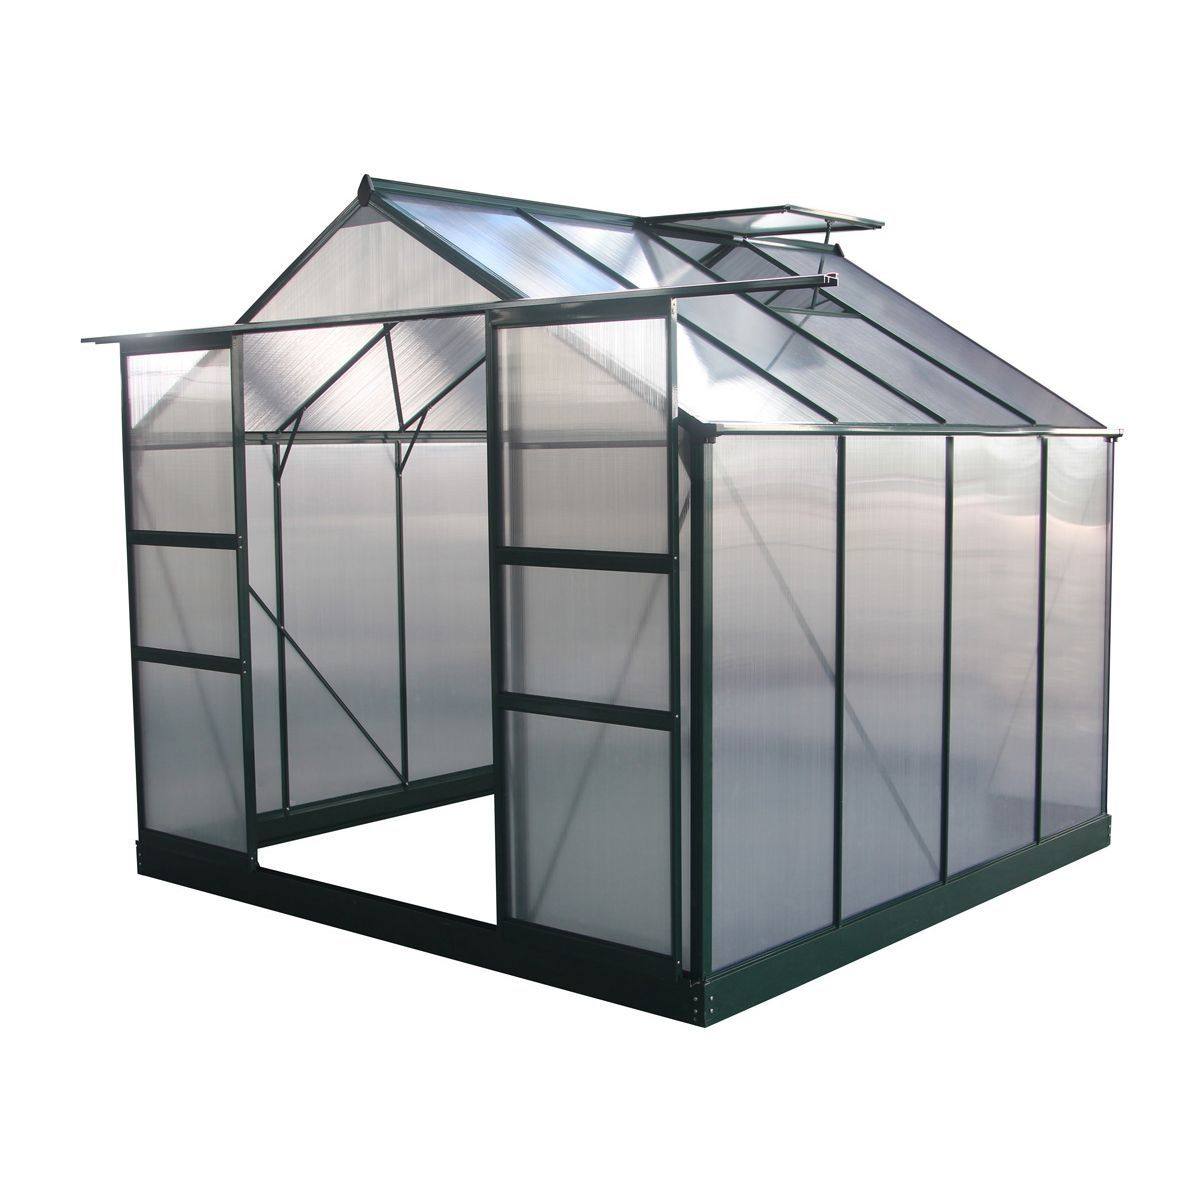 "Serre Jardin Polycarbonate ""dahlia"" Vert Sapin 6,15 M² ... avec Serre Jardin Polycarbonate"